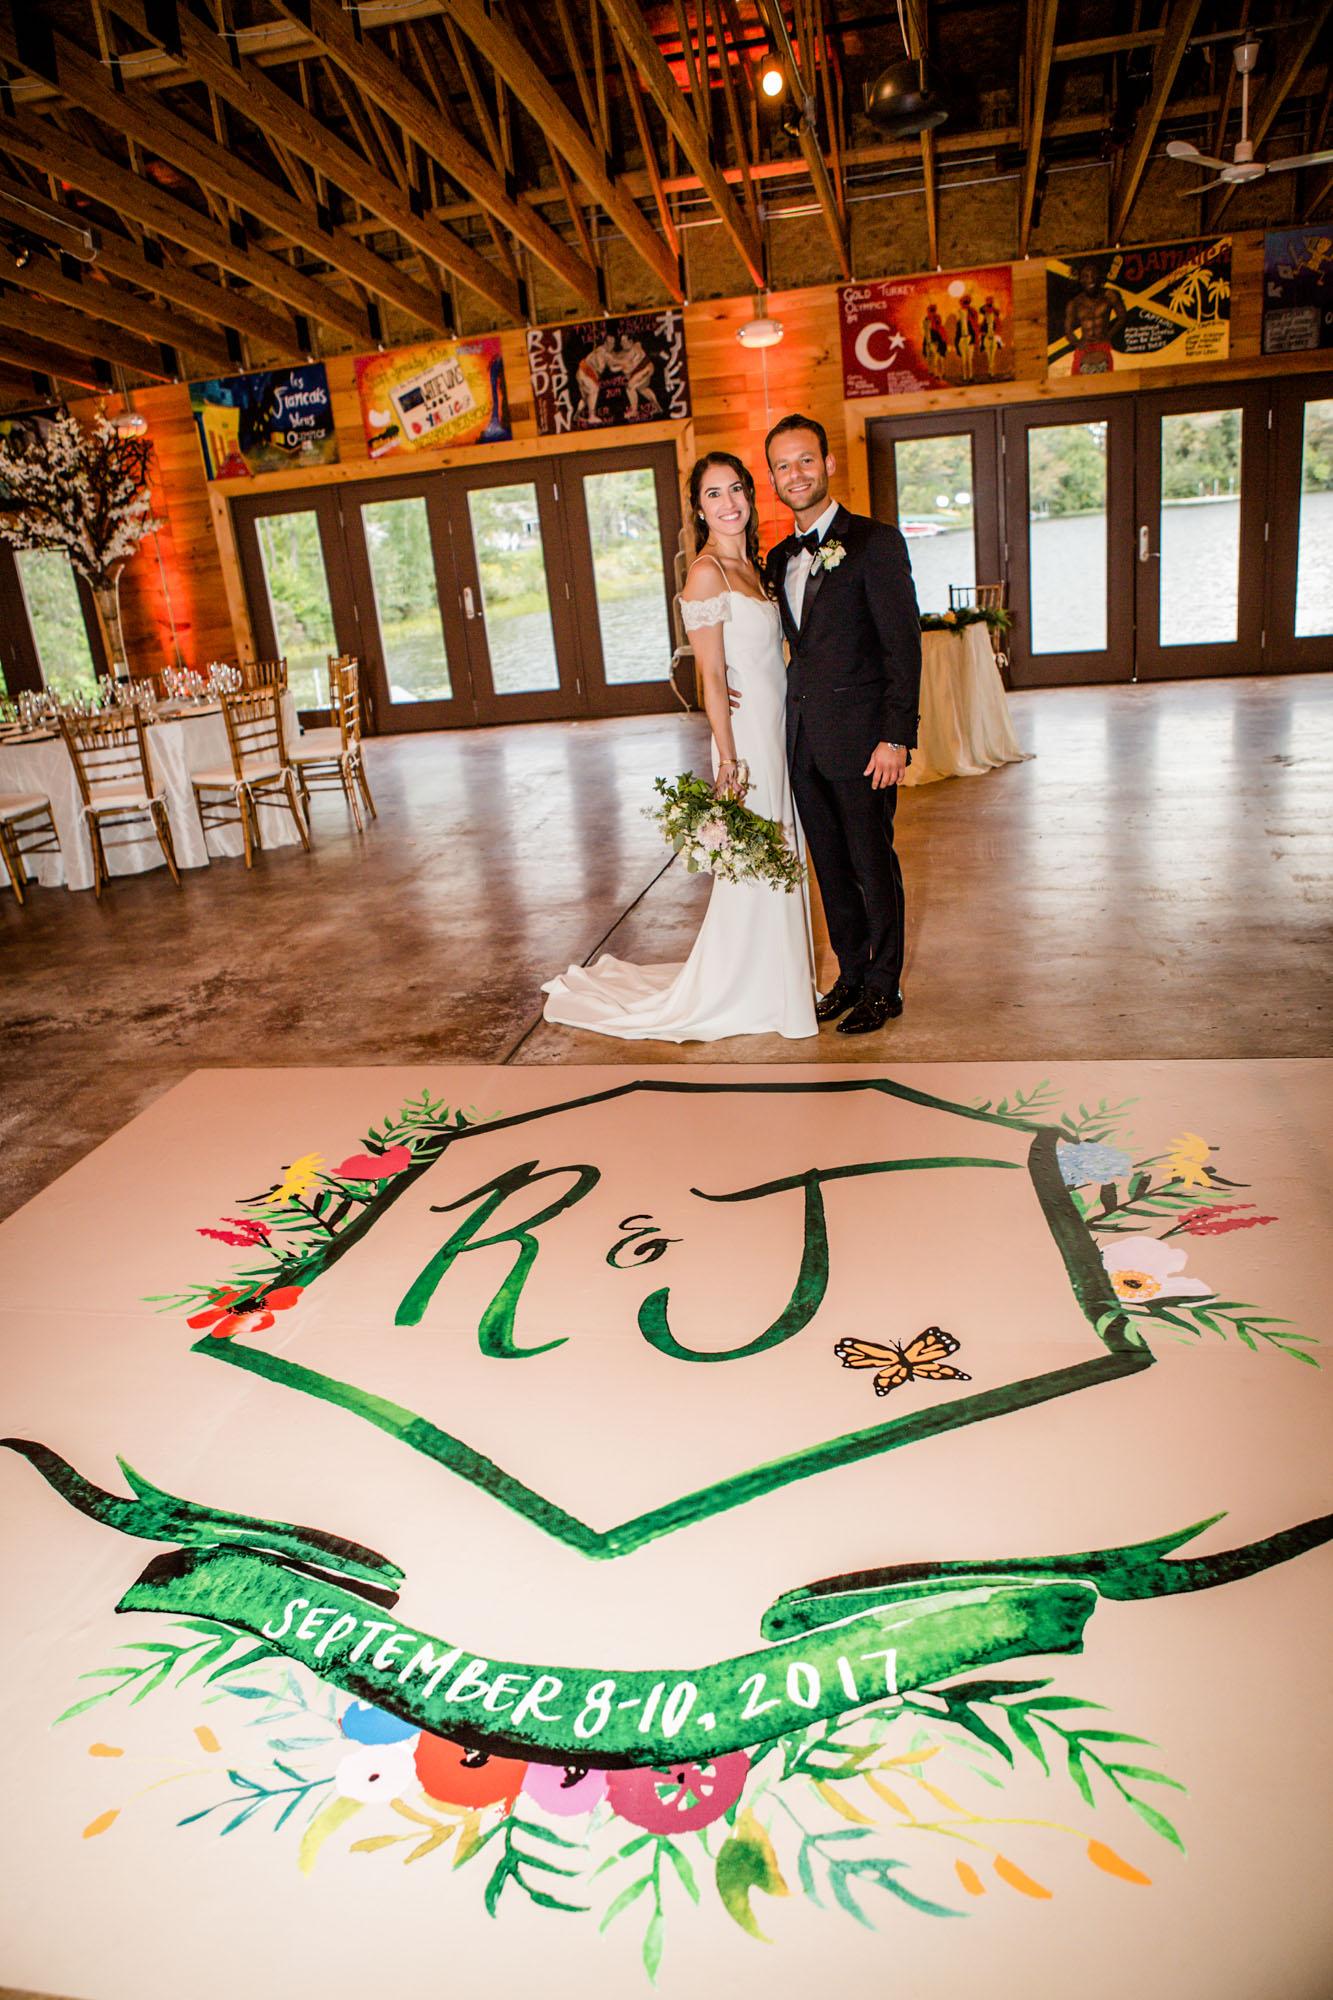 scranton_wedding_photographer_lettieri_pa (24 of 34).jpg